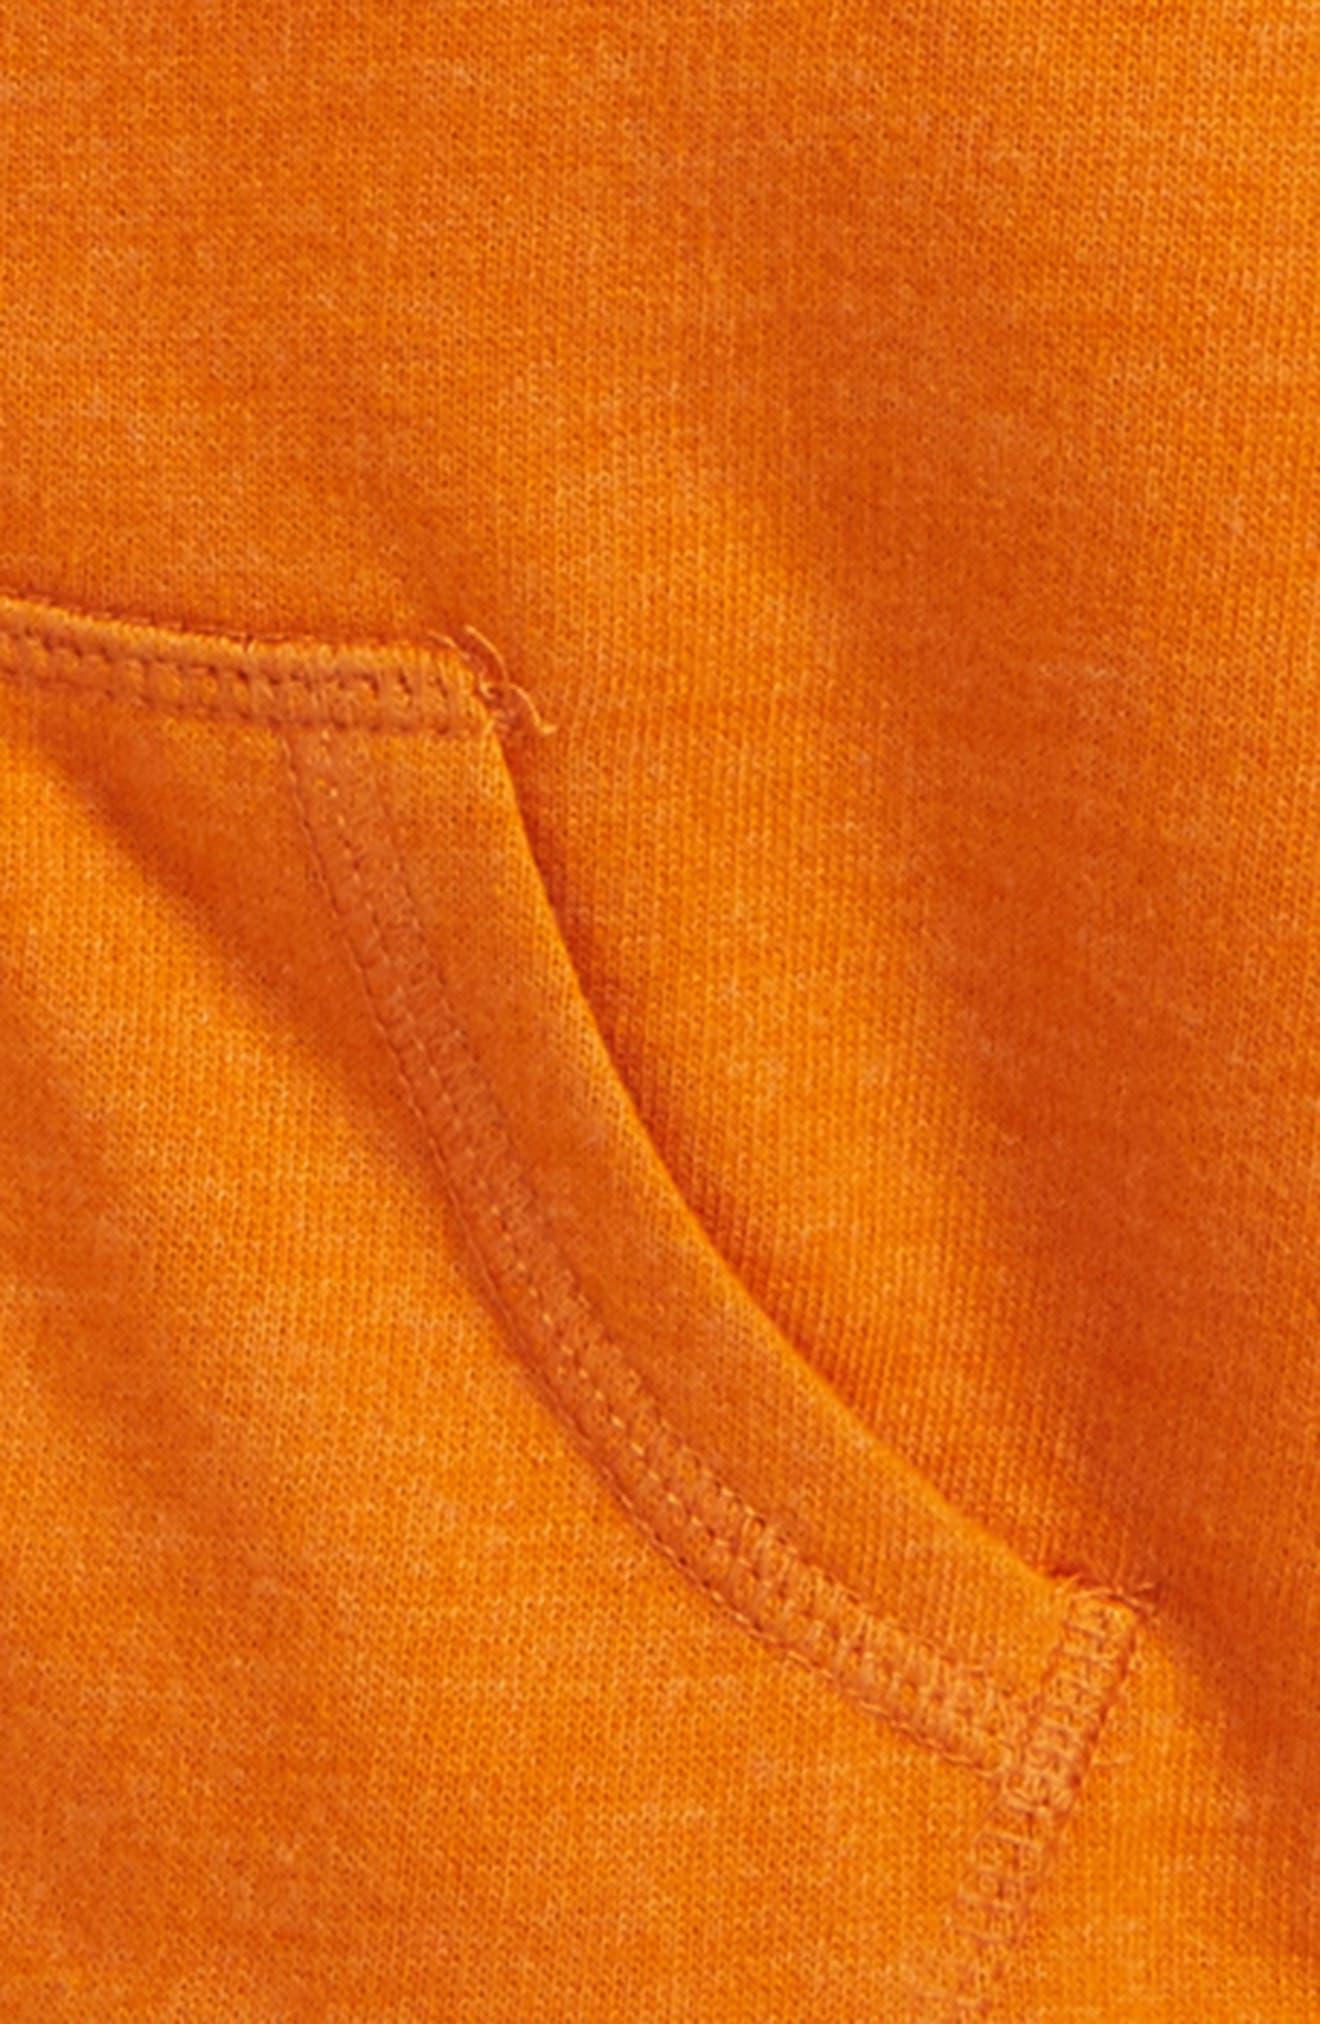 Fleece Lined Hoodie,                             Alternate thumbnail 2, color,                             Orange Hawaii